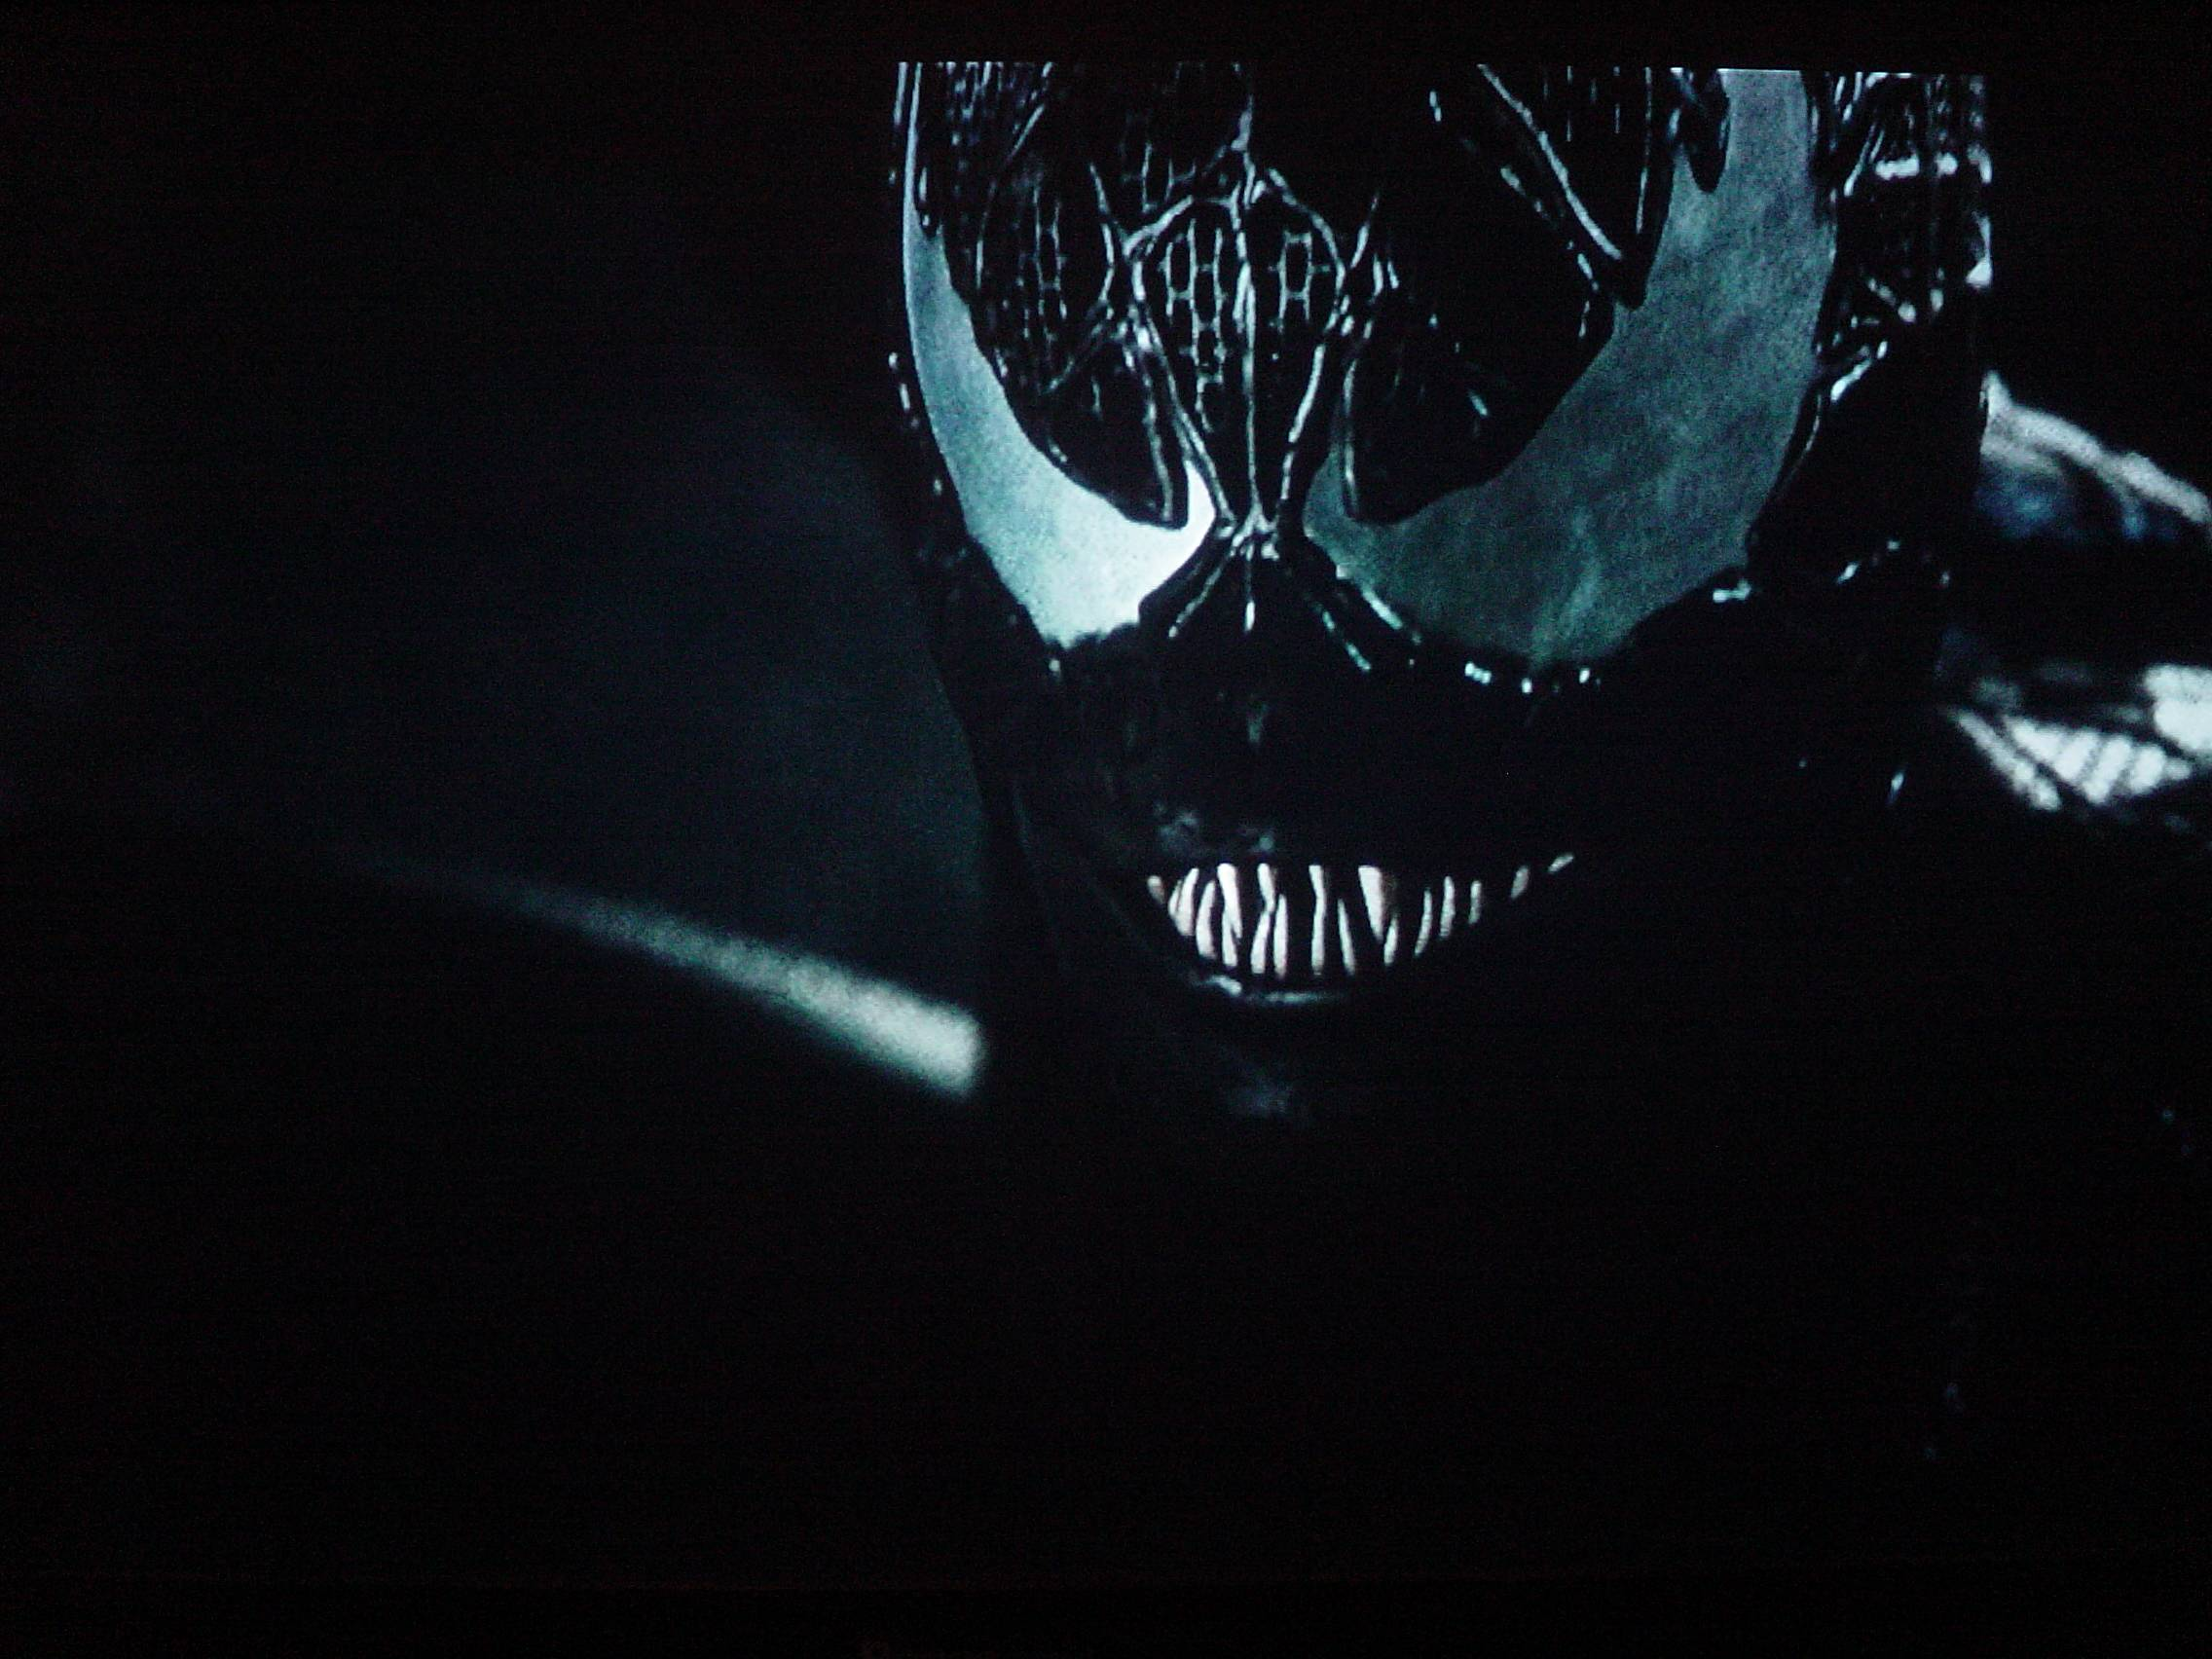 Spider man venom wallpapers wallpaper cave - Spiderman iphone x wallpaper ...